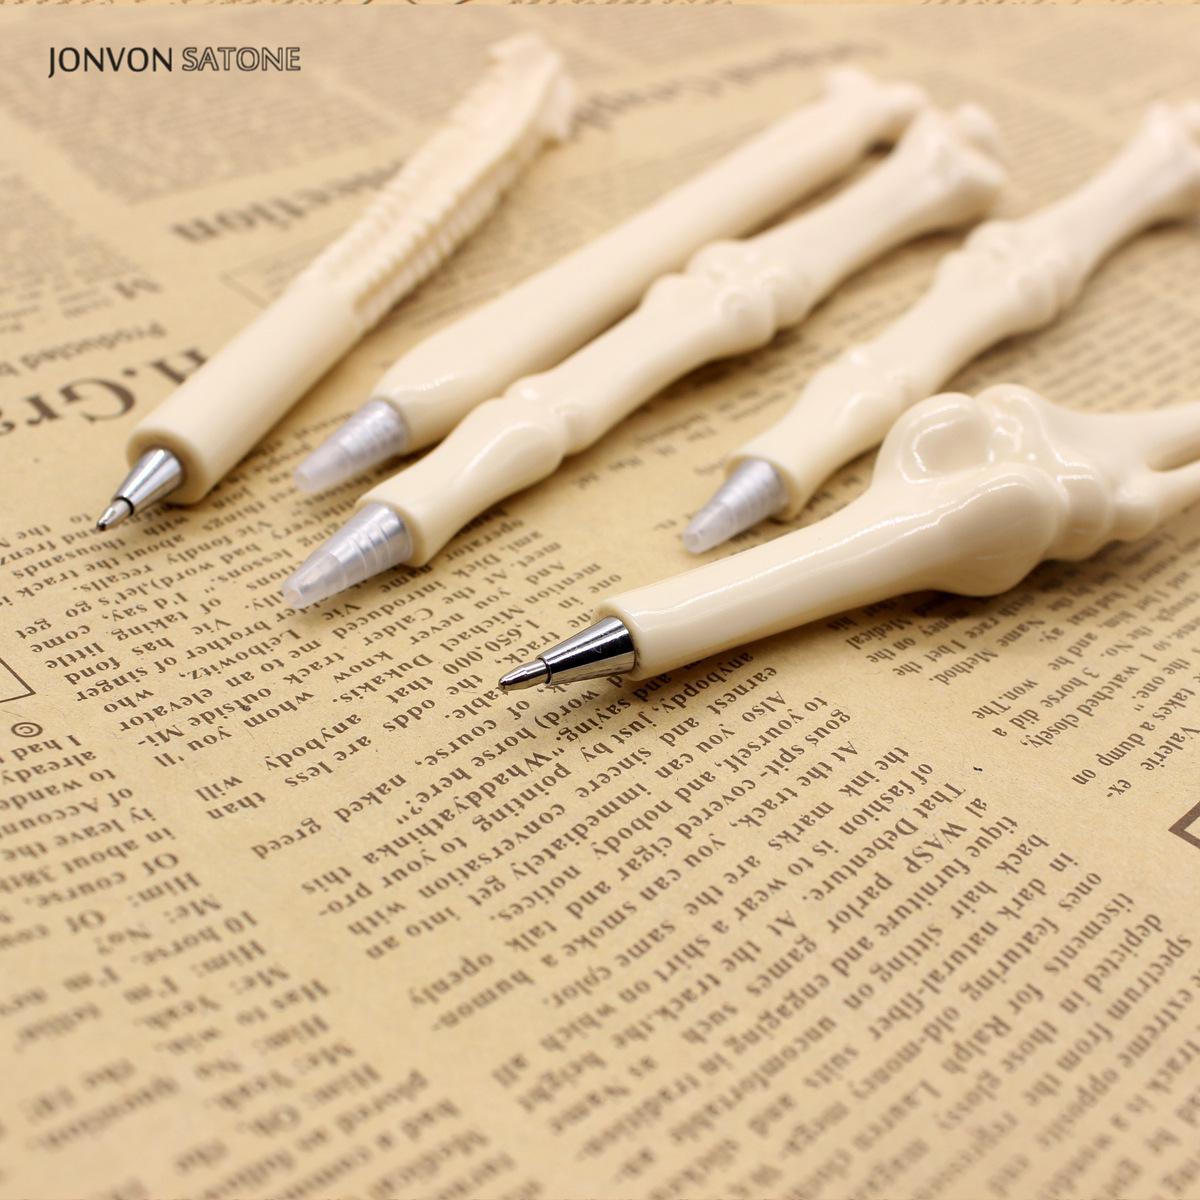 Jonvon Satone 100 Pcs Wholesale Bone Pen Ball Pens Monster Toy Ballpoint Pen Stationery School Supplies Office Accessories Stylo